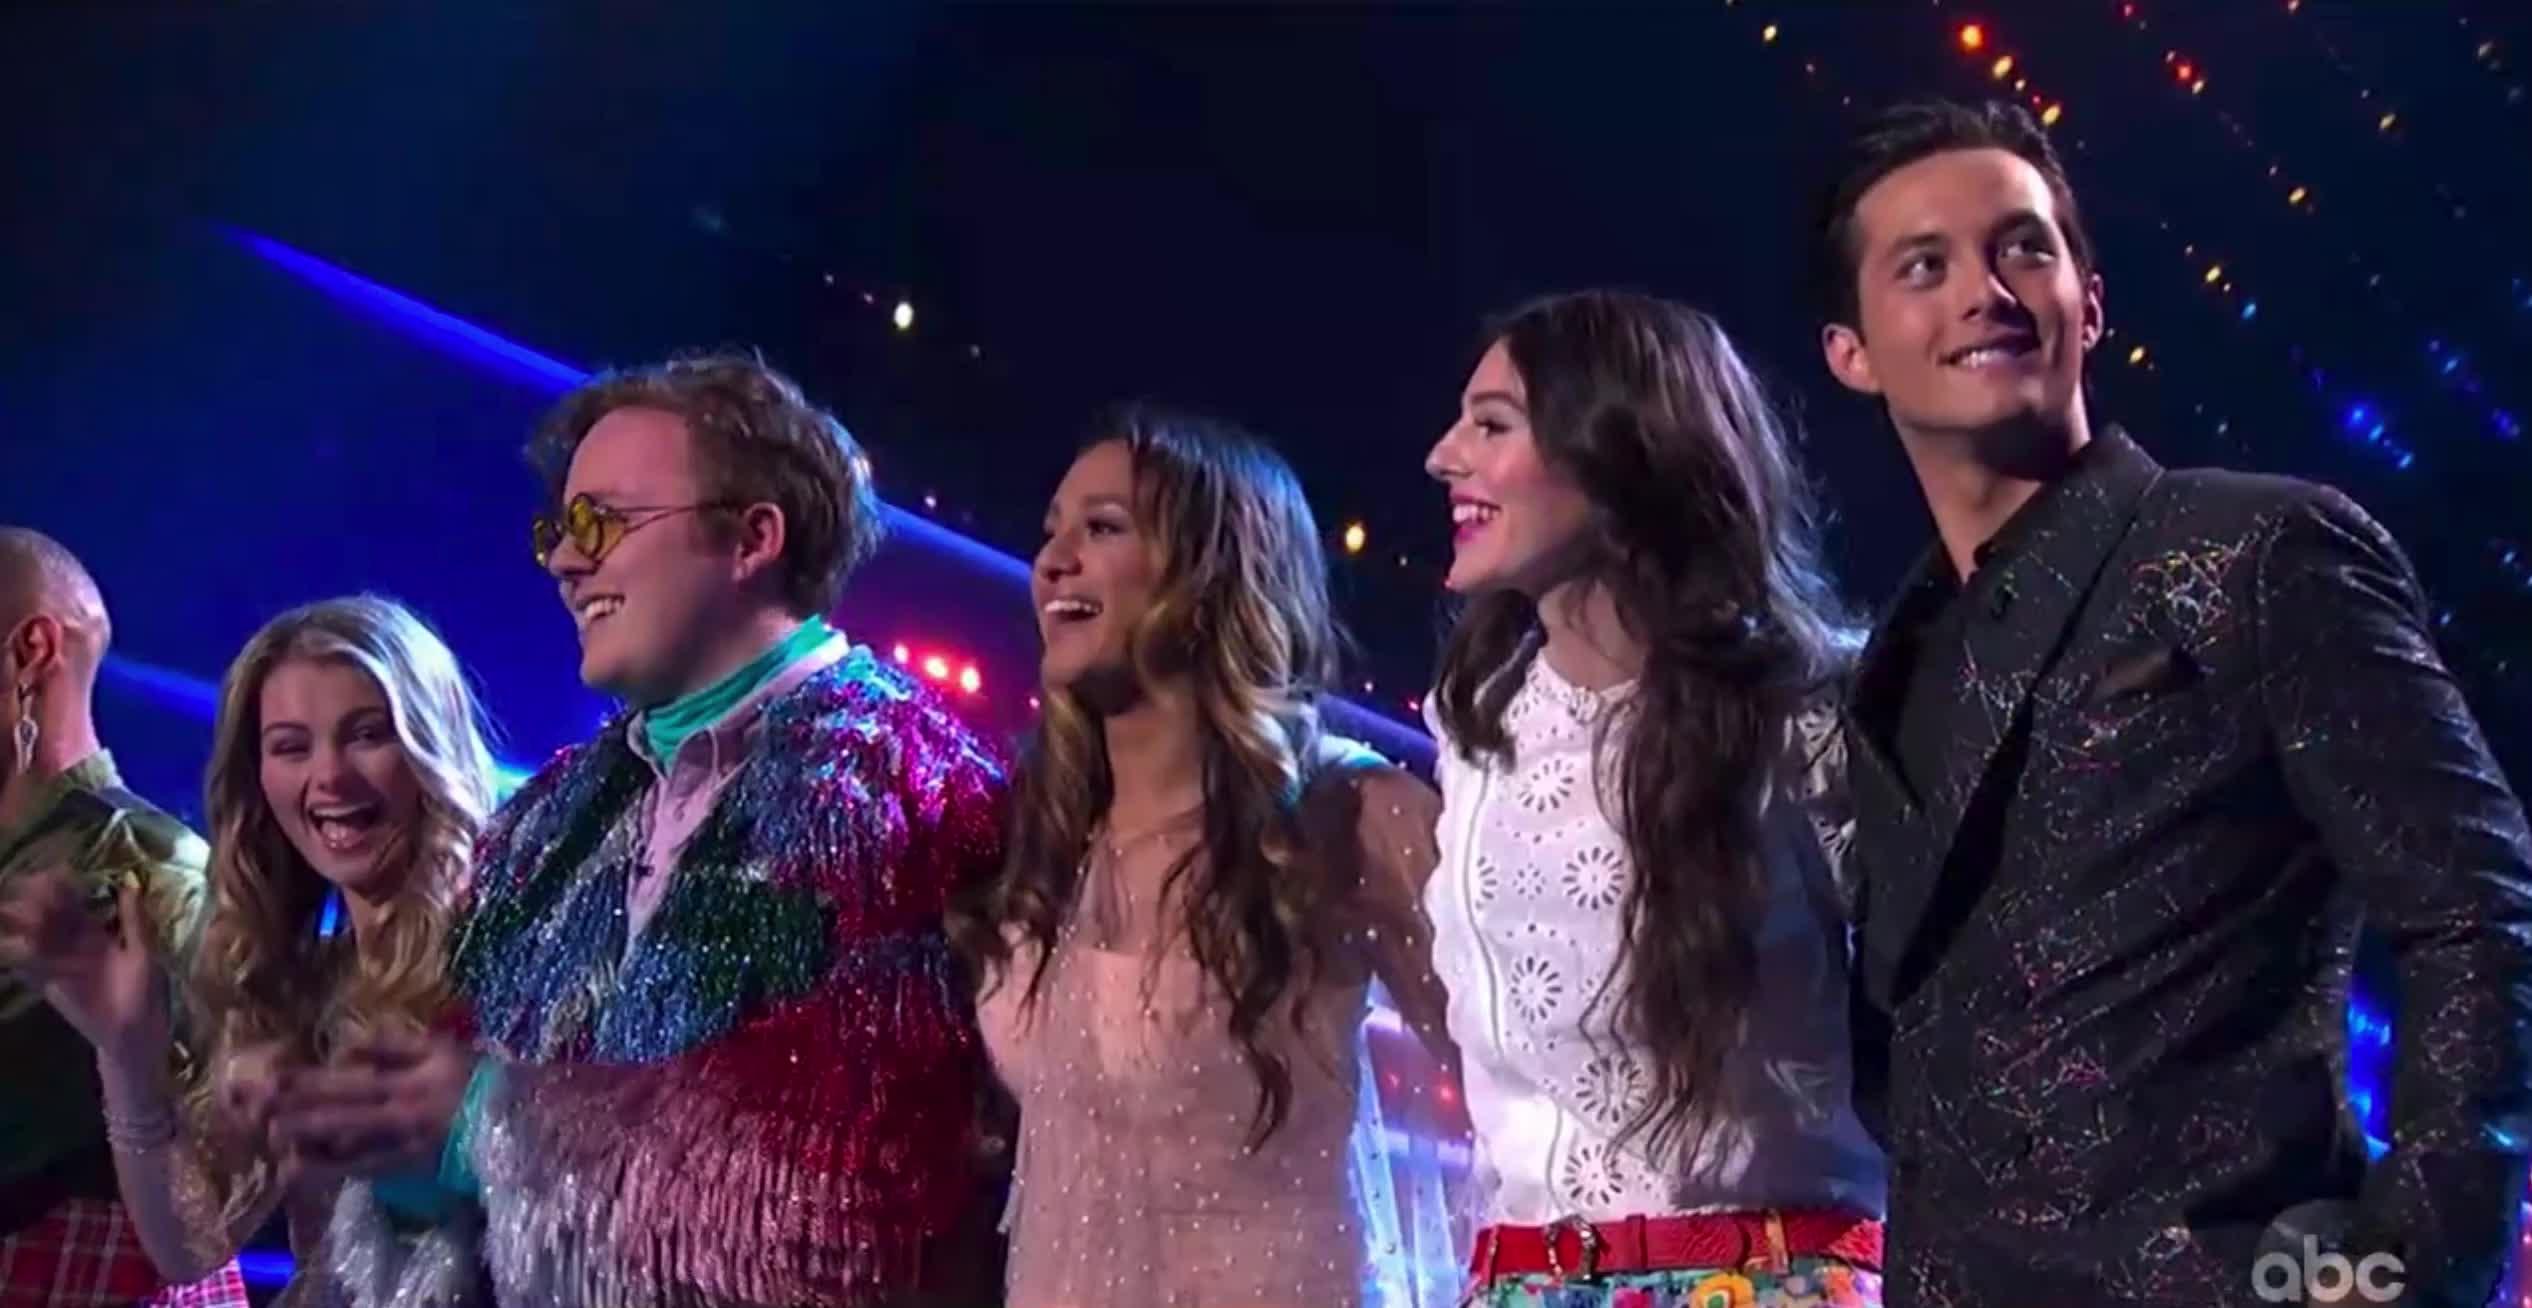 american idol, american idol season 17, americanidol, katy perry, lionel richie, luke bryan, ryan seacrest, season 17, singing, American Idol The Contestants GIFs